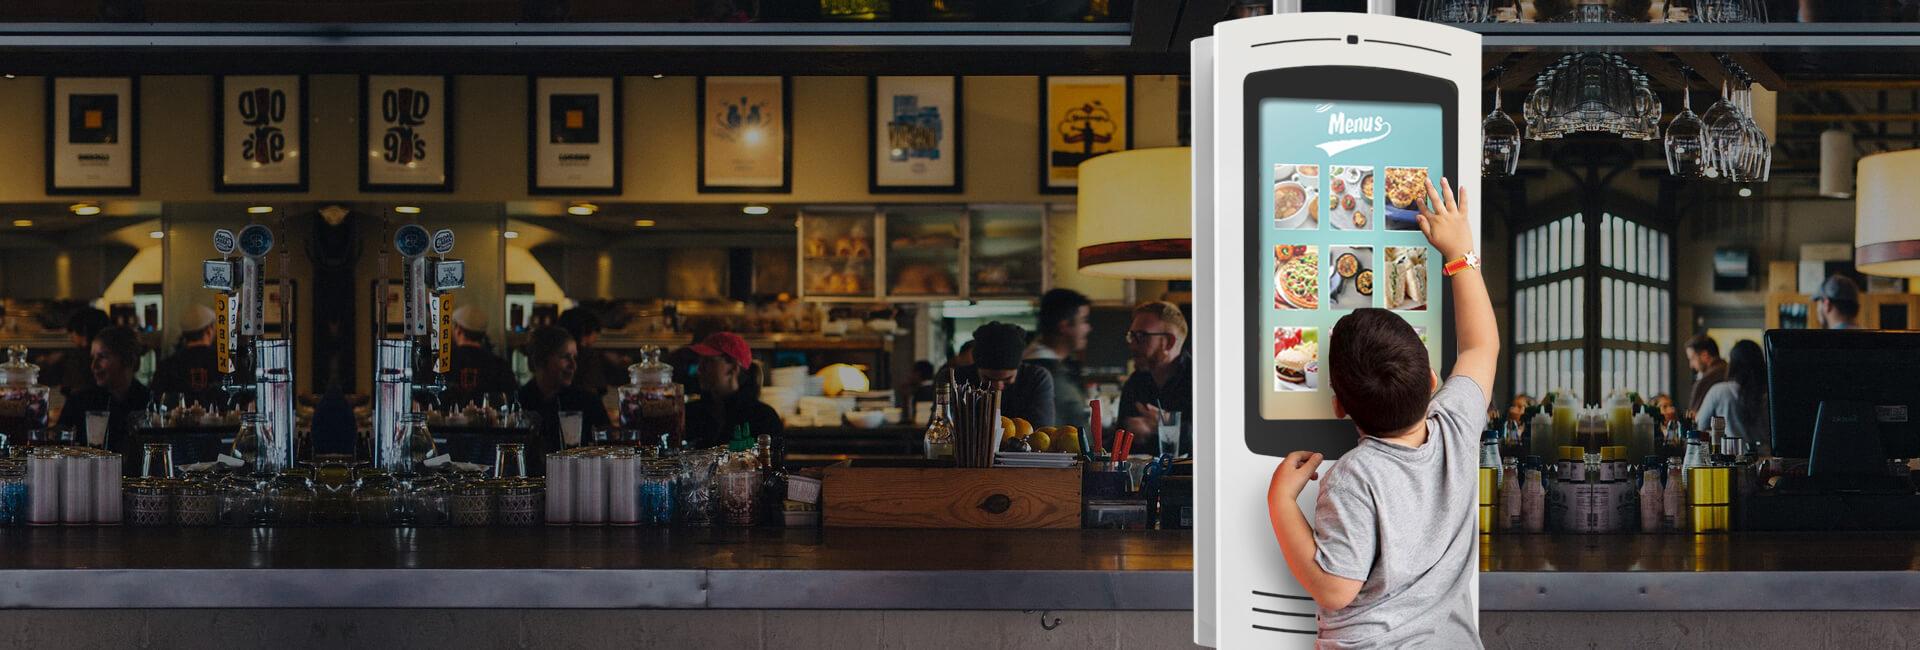 Self-service Kiosks for Restaurants (QSR)